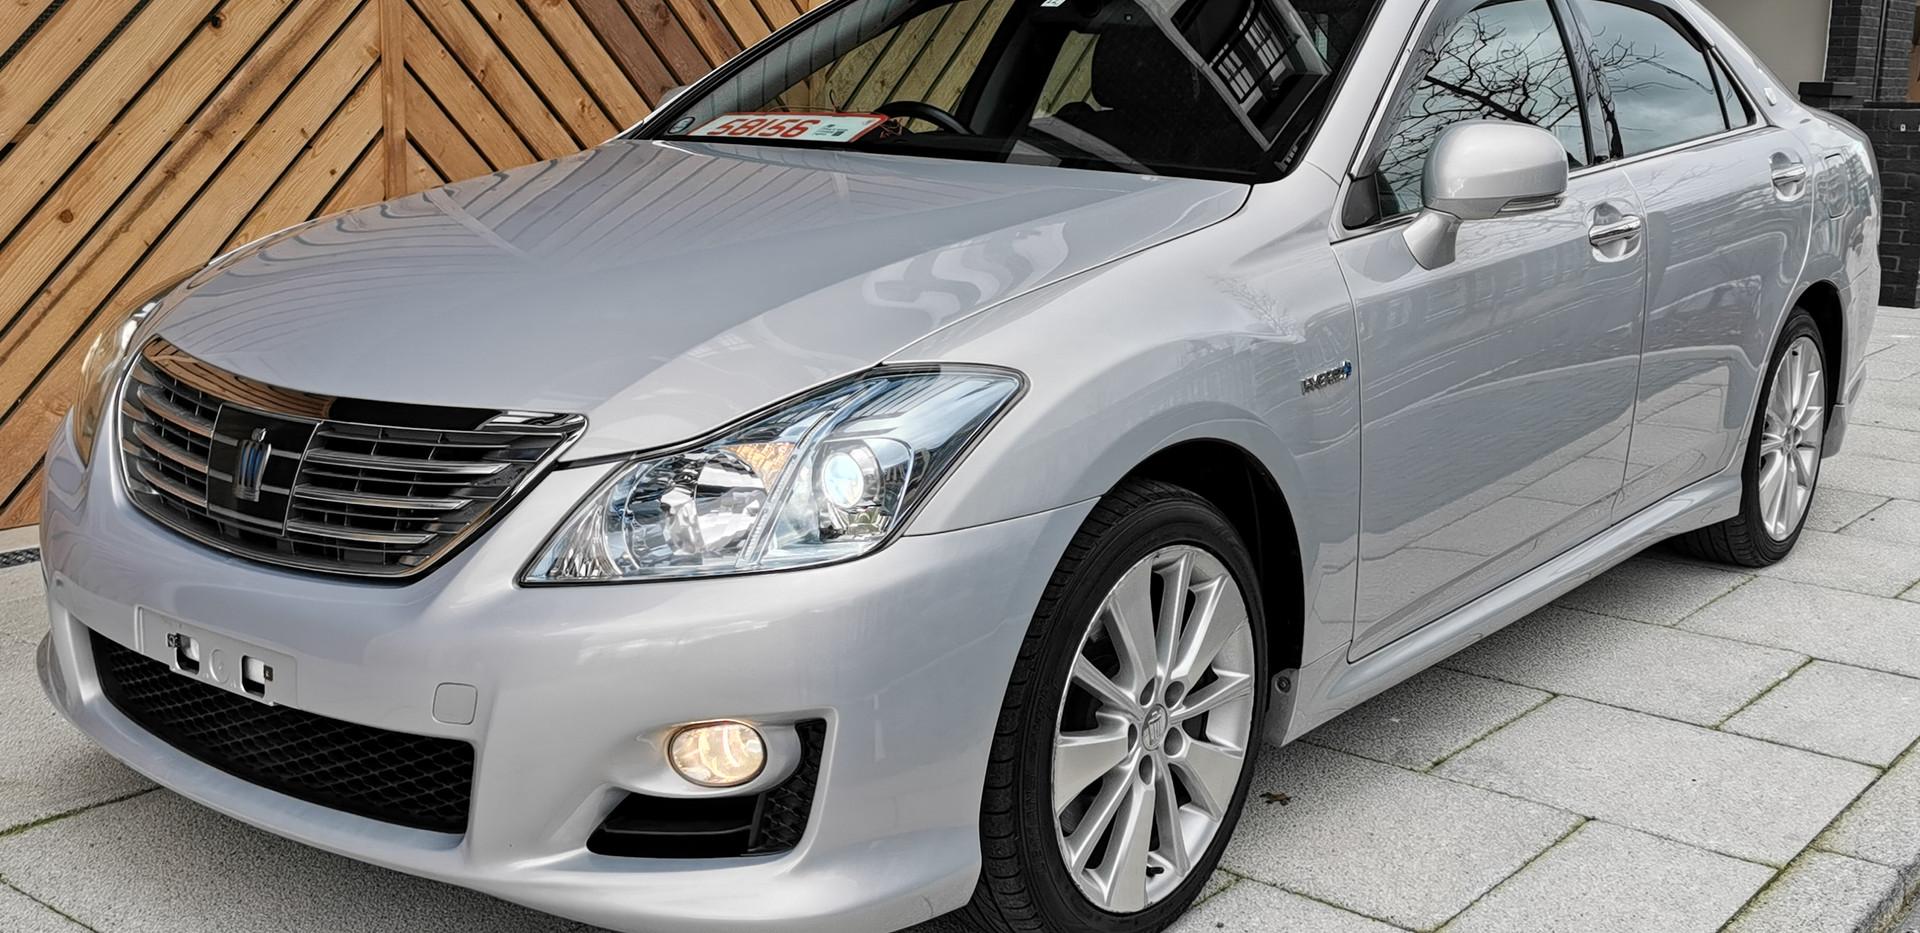 Toyota Crown Hybrid V6 in UK London